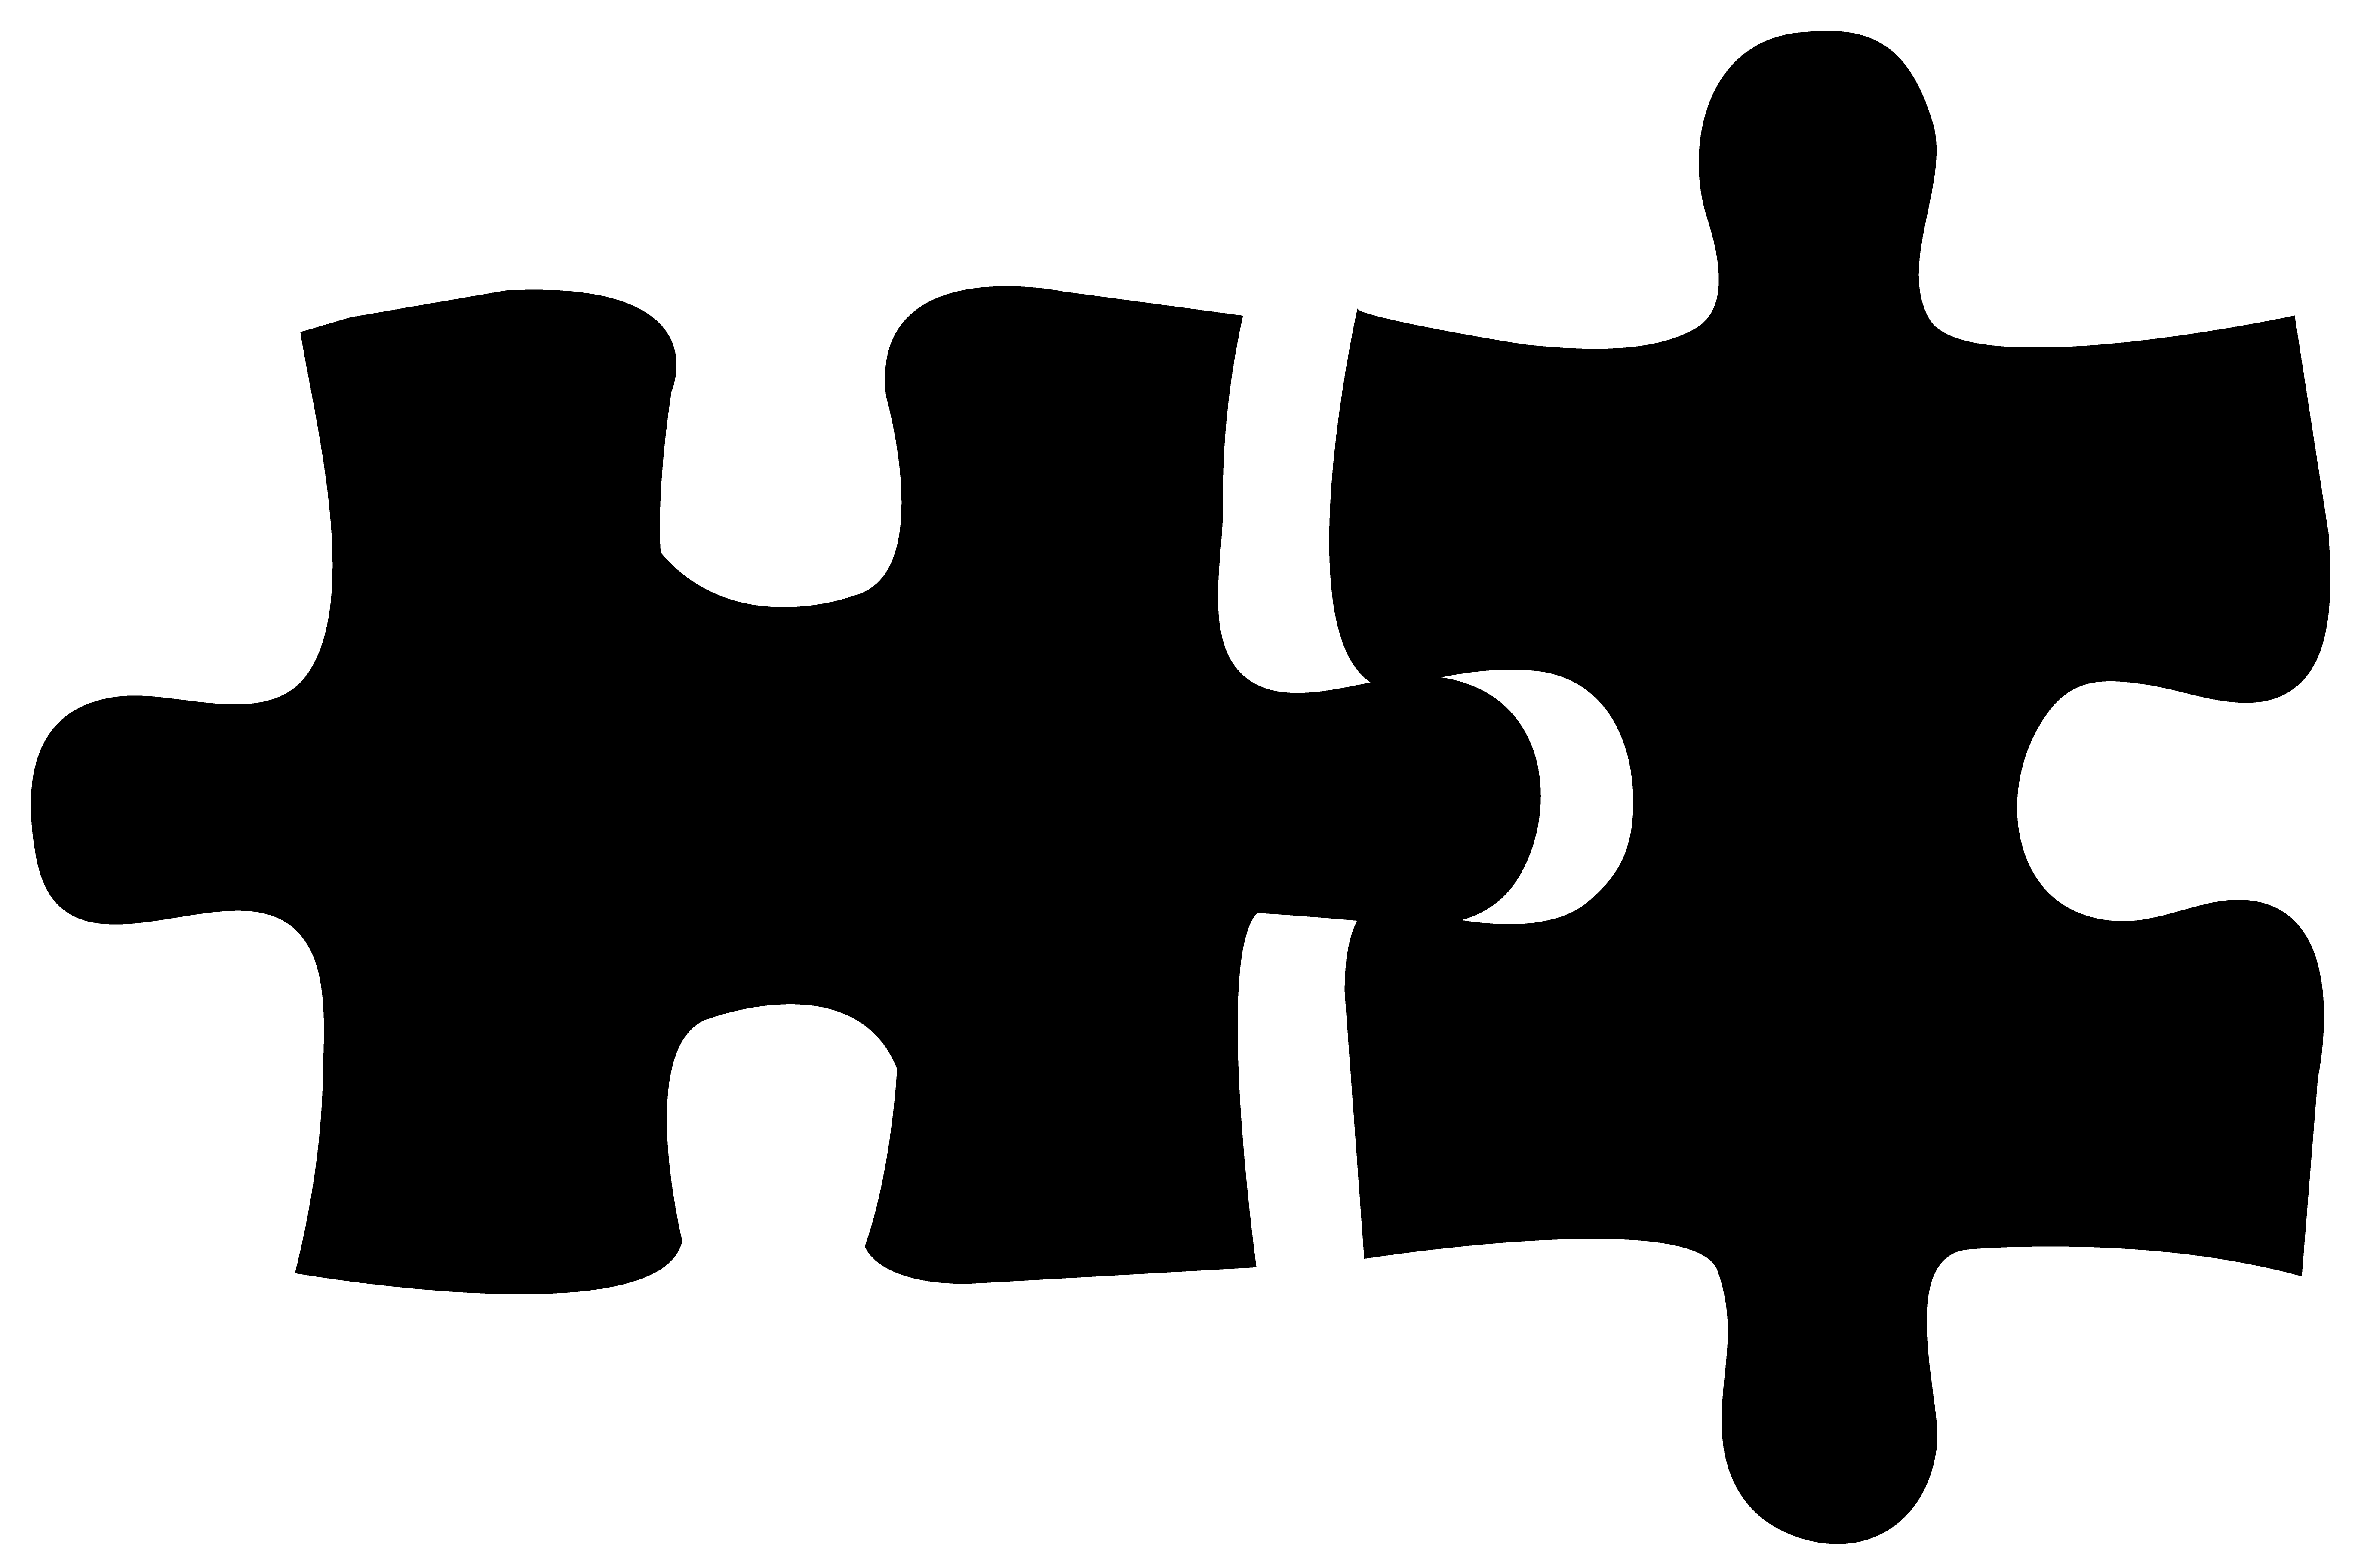 Clipart Connection.